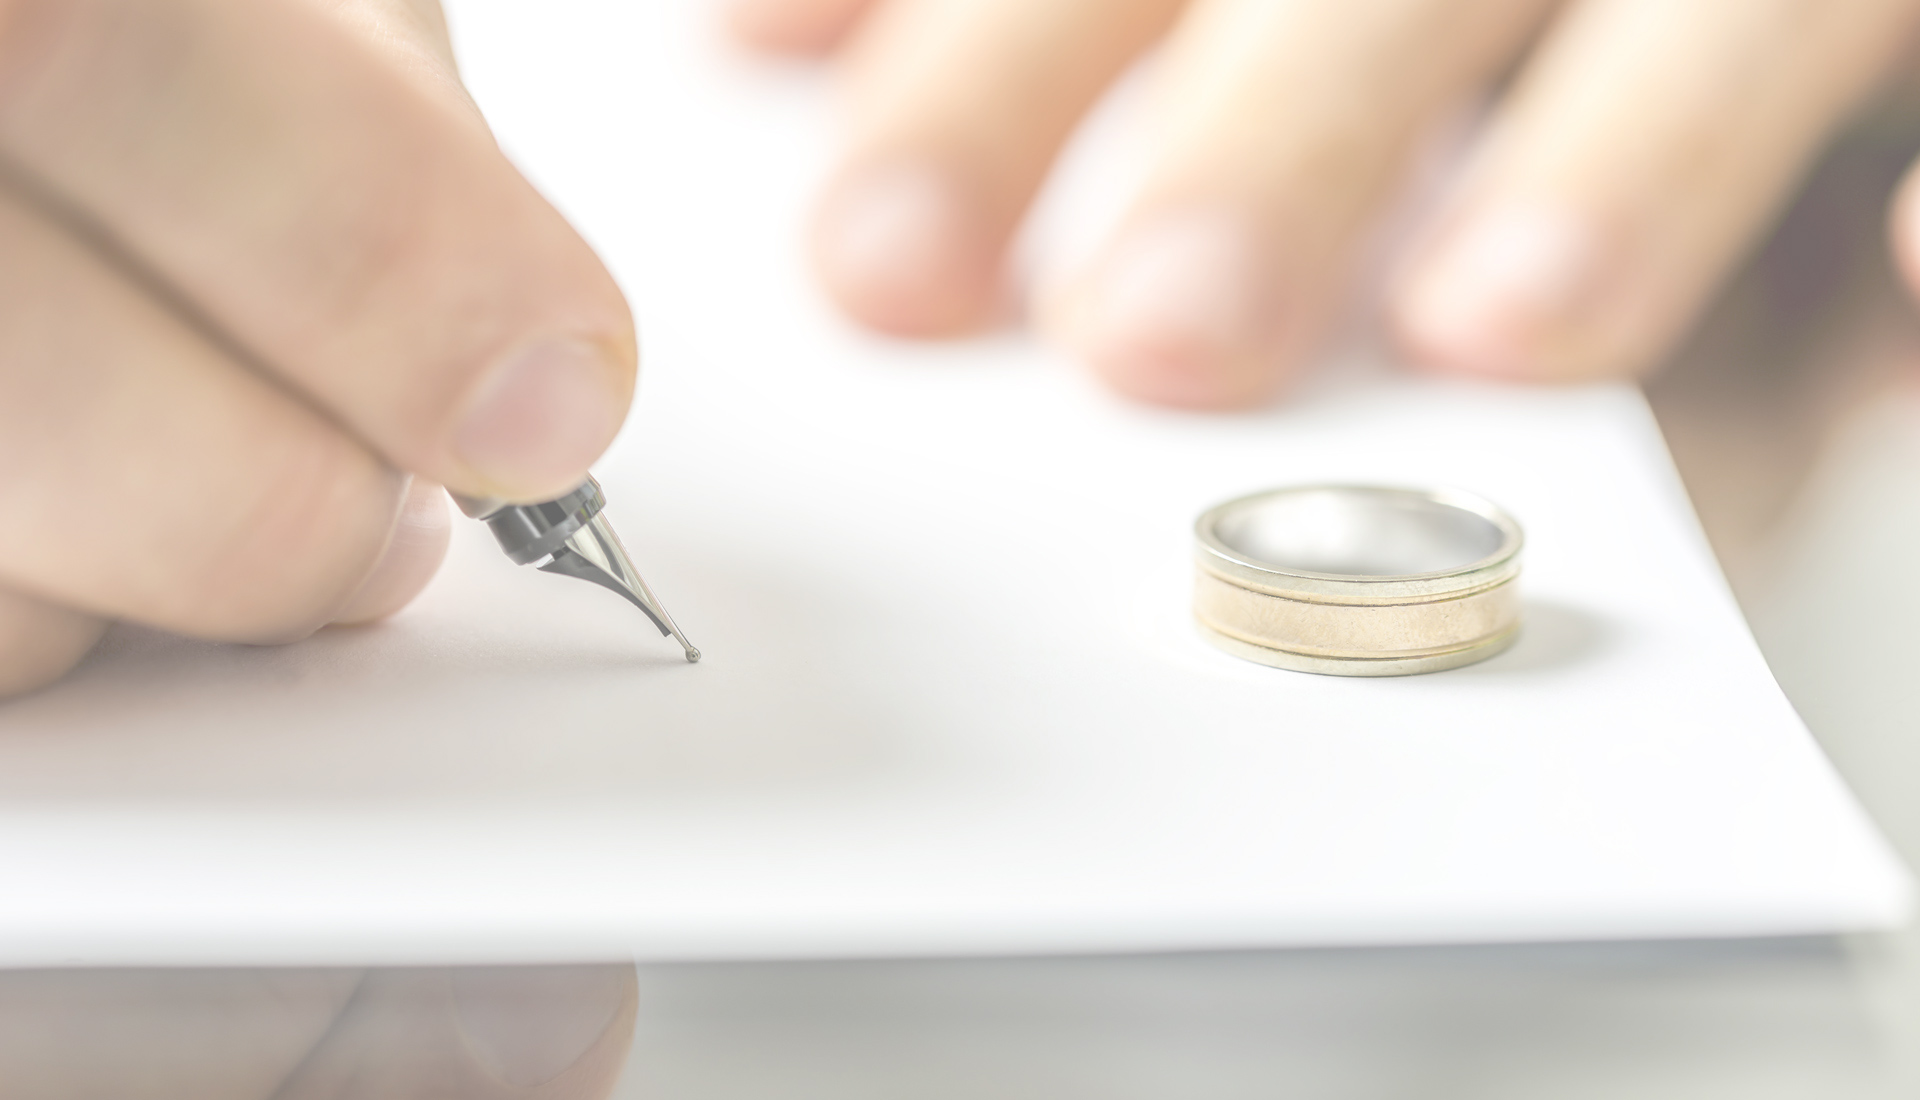 Kadan Hassan | Divorce Mediation Service Divorce Mediation Service